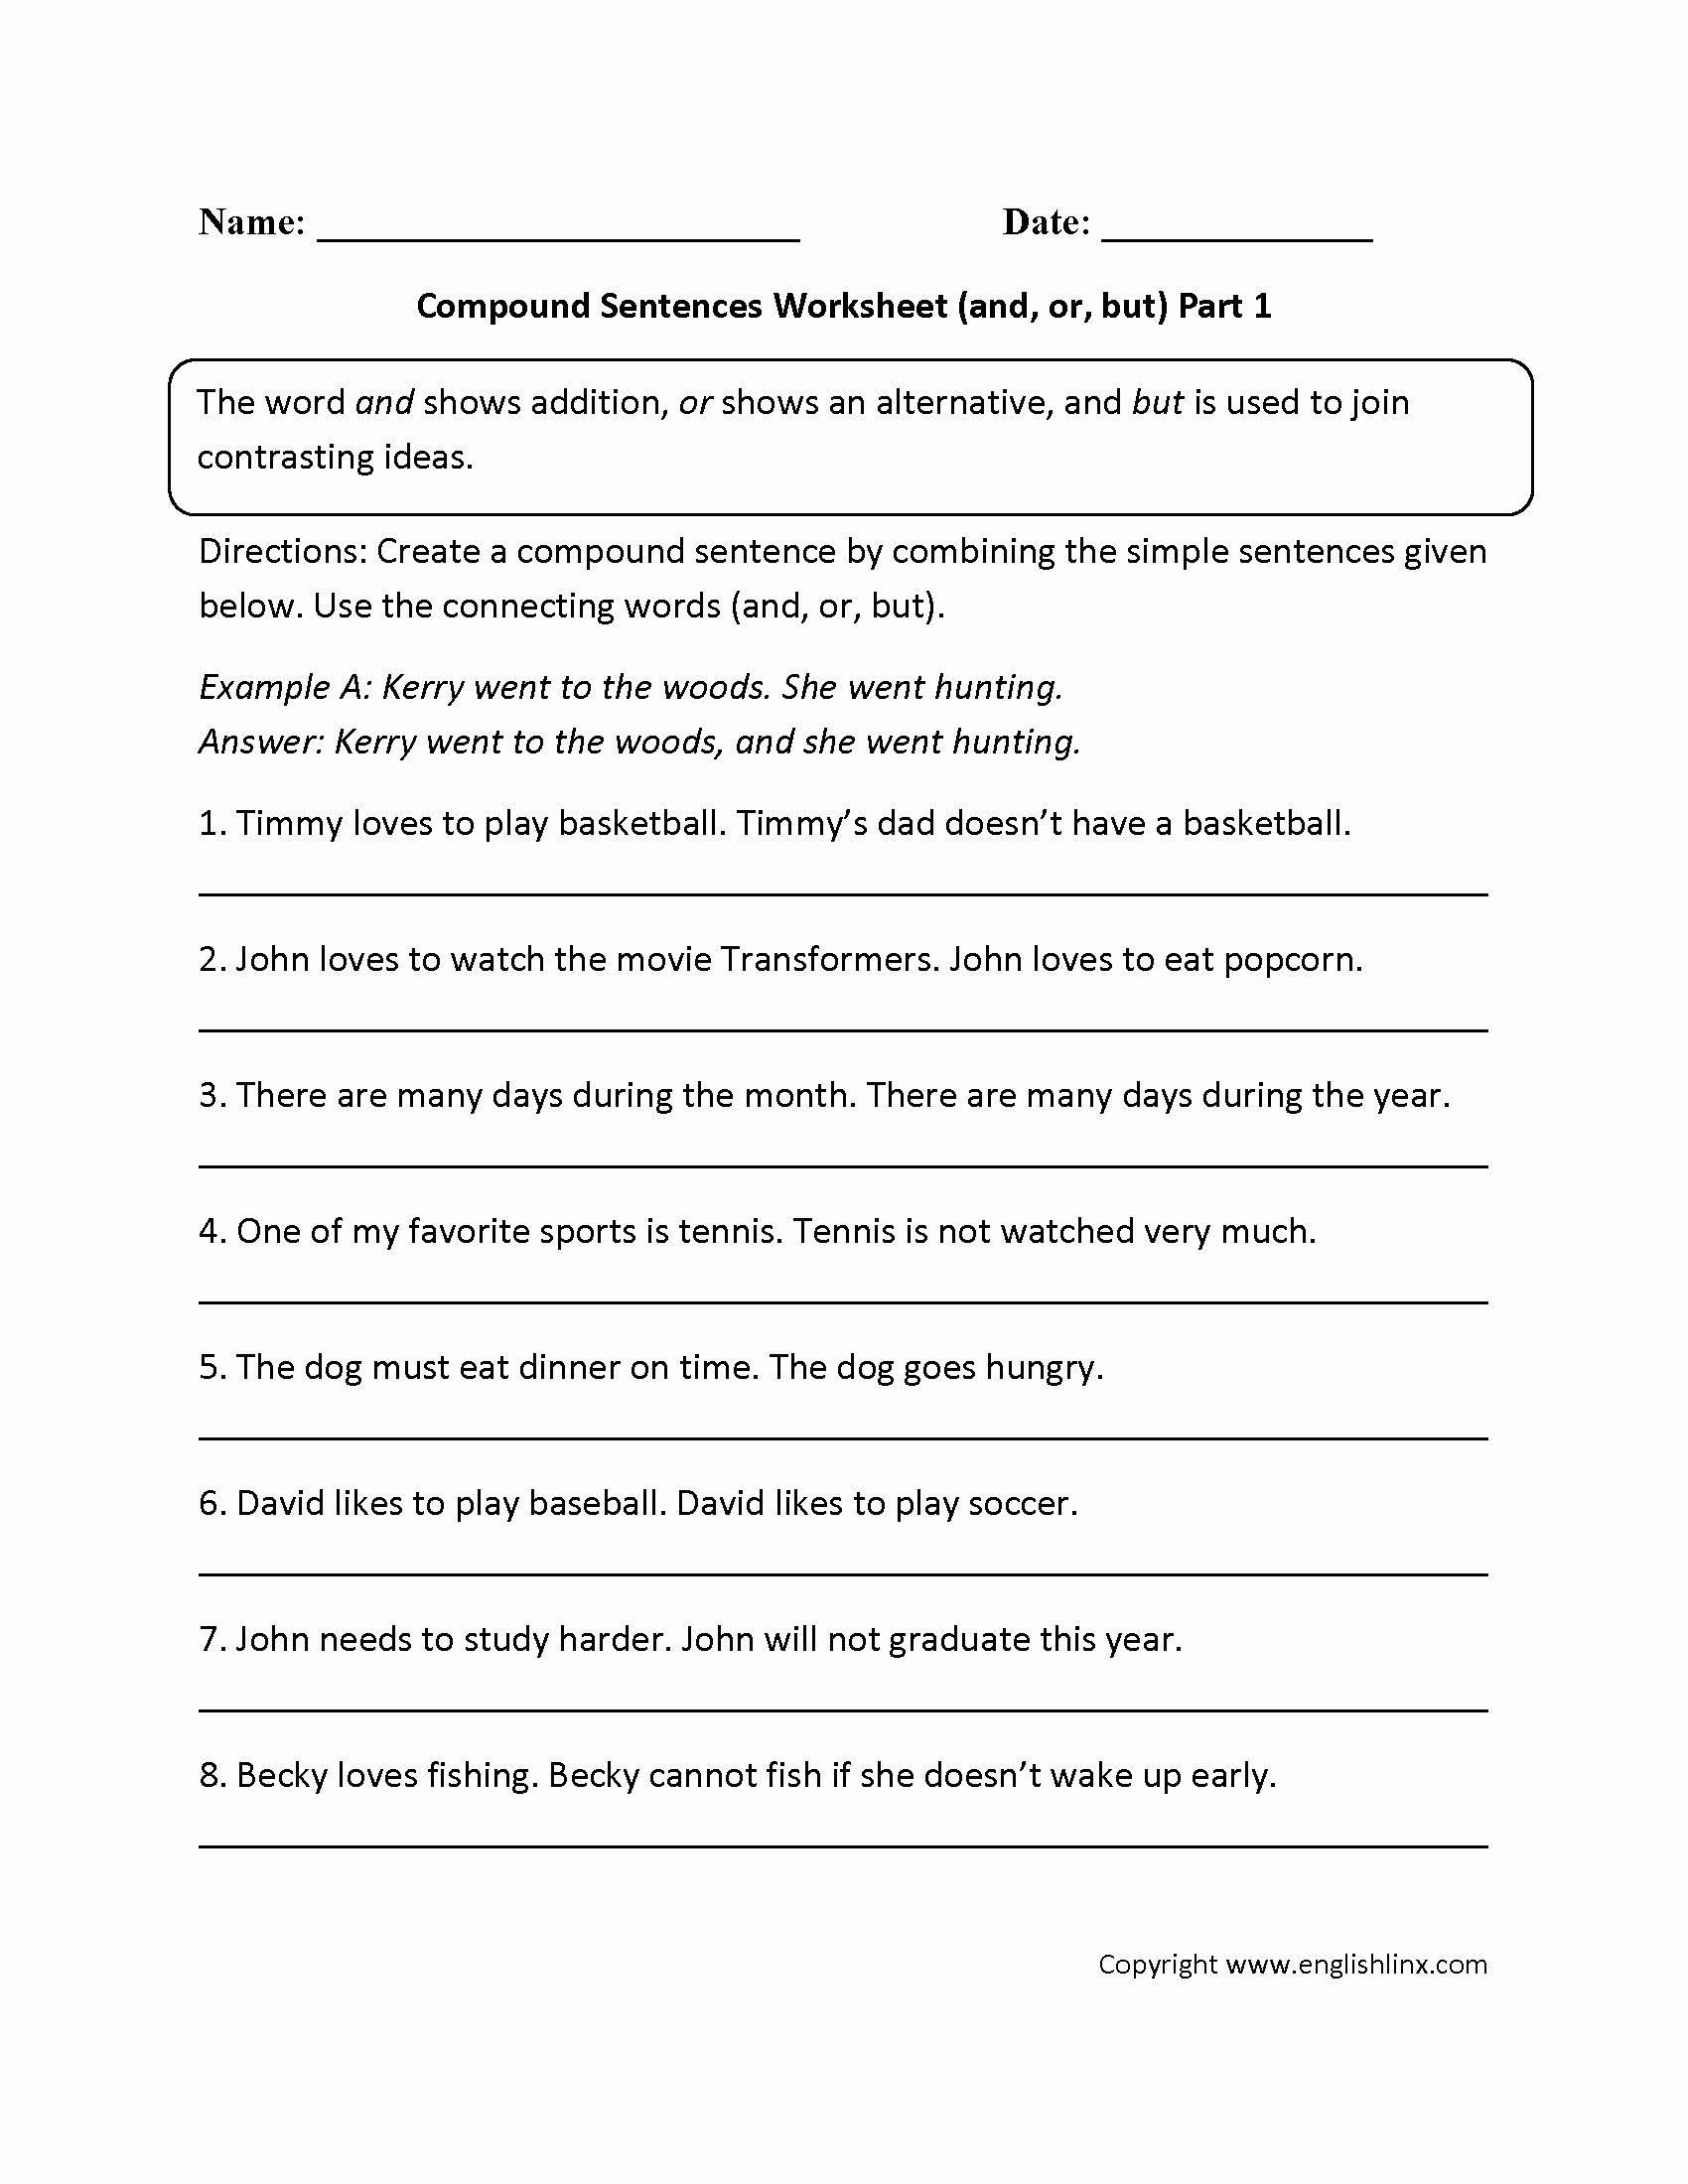 Compound Sentences Worksheet Pdf Awesome Sentences Worksheets In 2020 Compound Sentences Complex Sentences Worksheets Simple And Compound Sentences